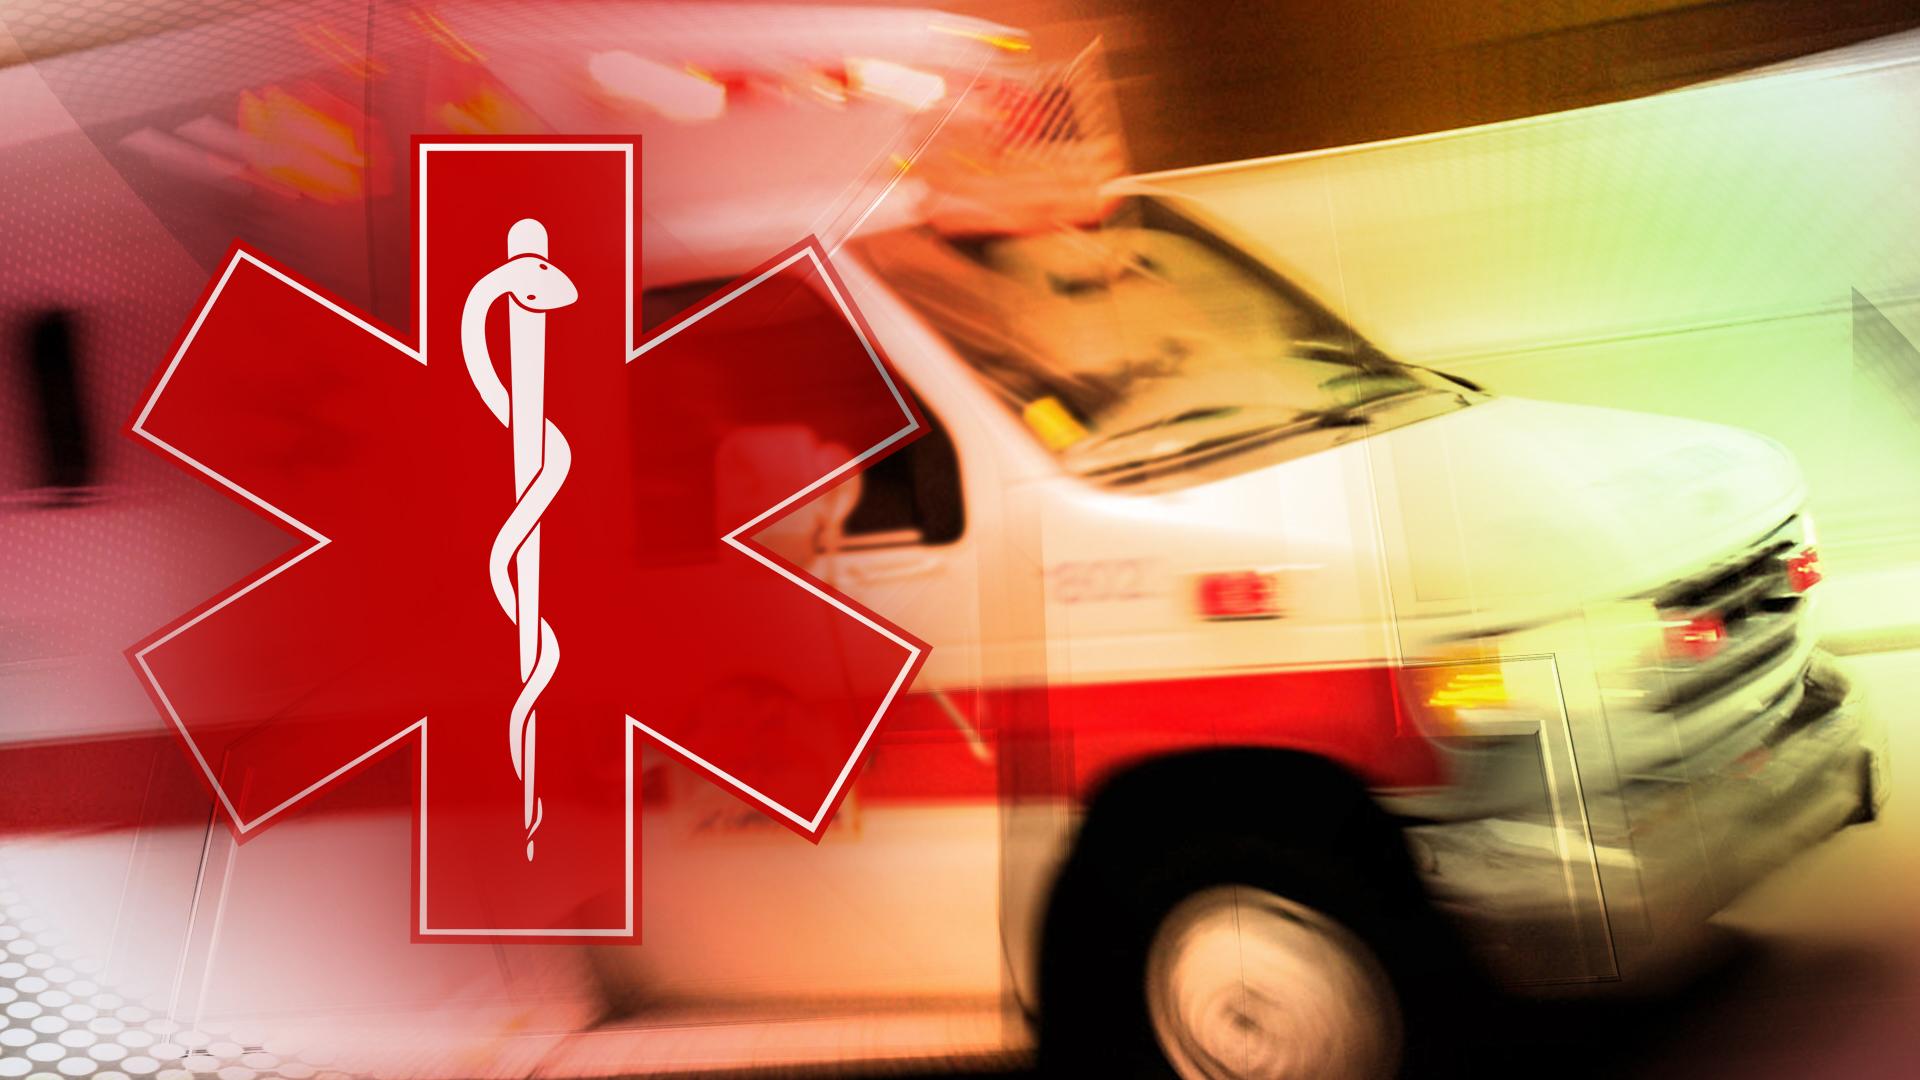 FS Ambulance_1556686428837.jpg.jpg